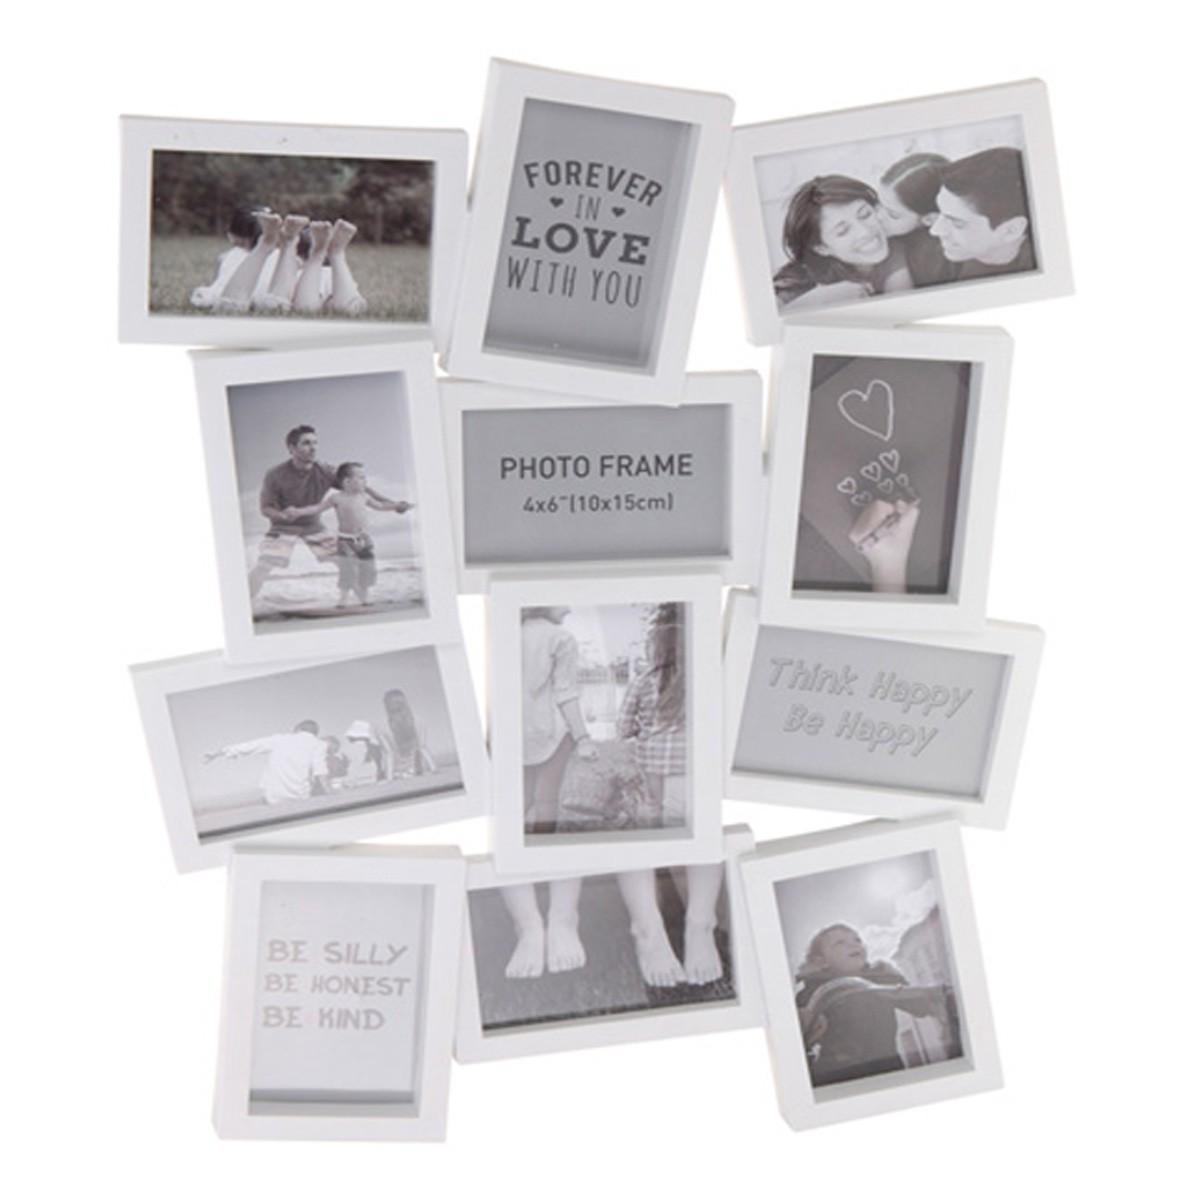 bilderrahmen 62x48cm f r 12 fotos aus kunststoff fotorahmen collage. Black Bedroom Furniture Sets. Home Design Ideas